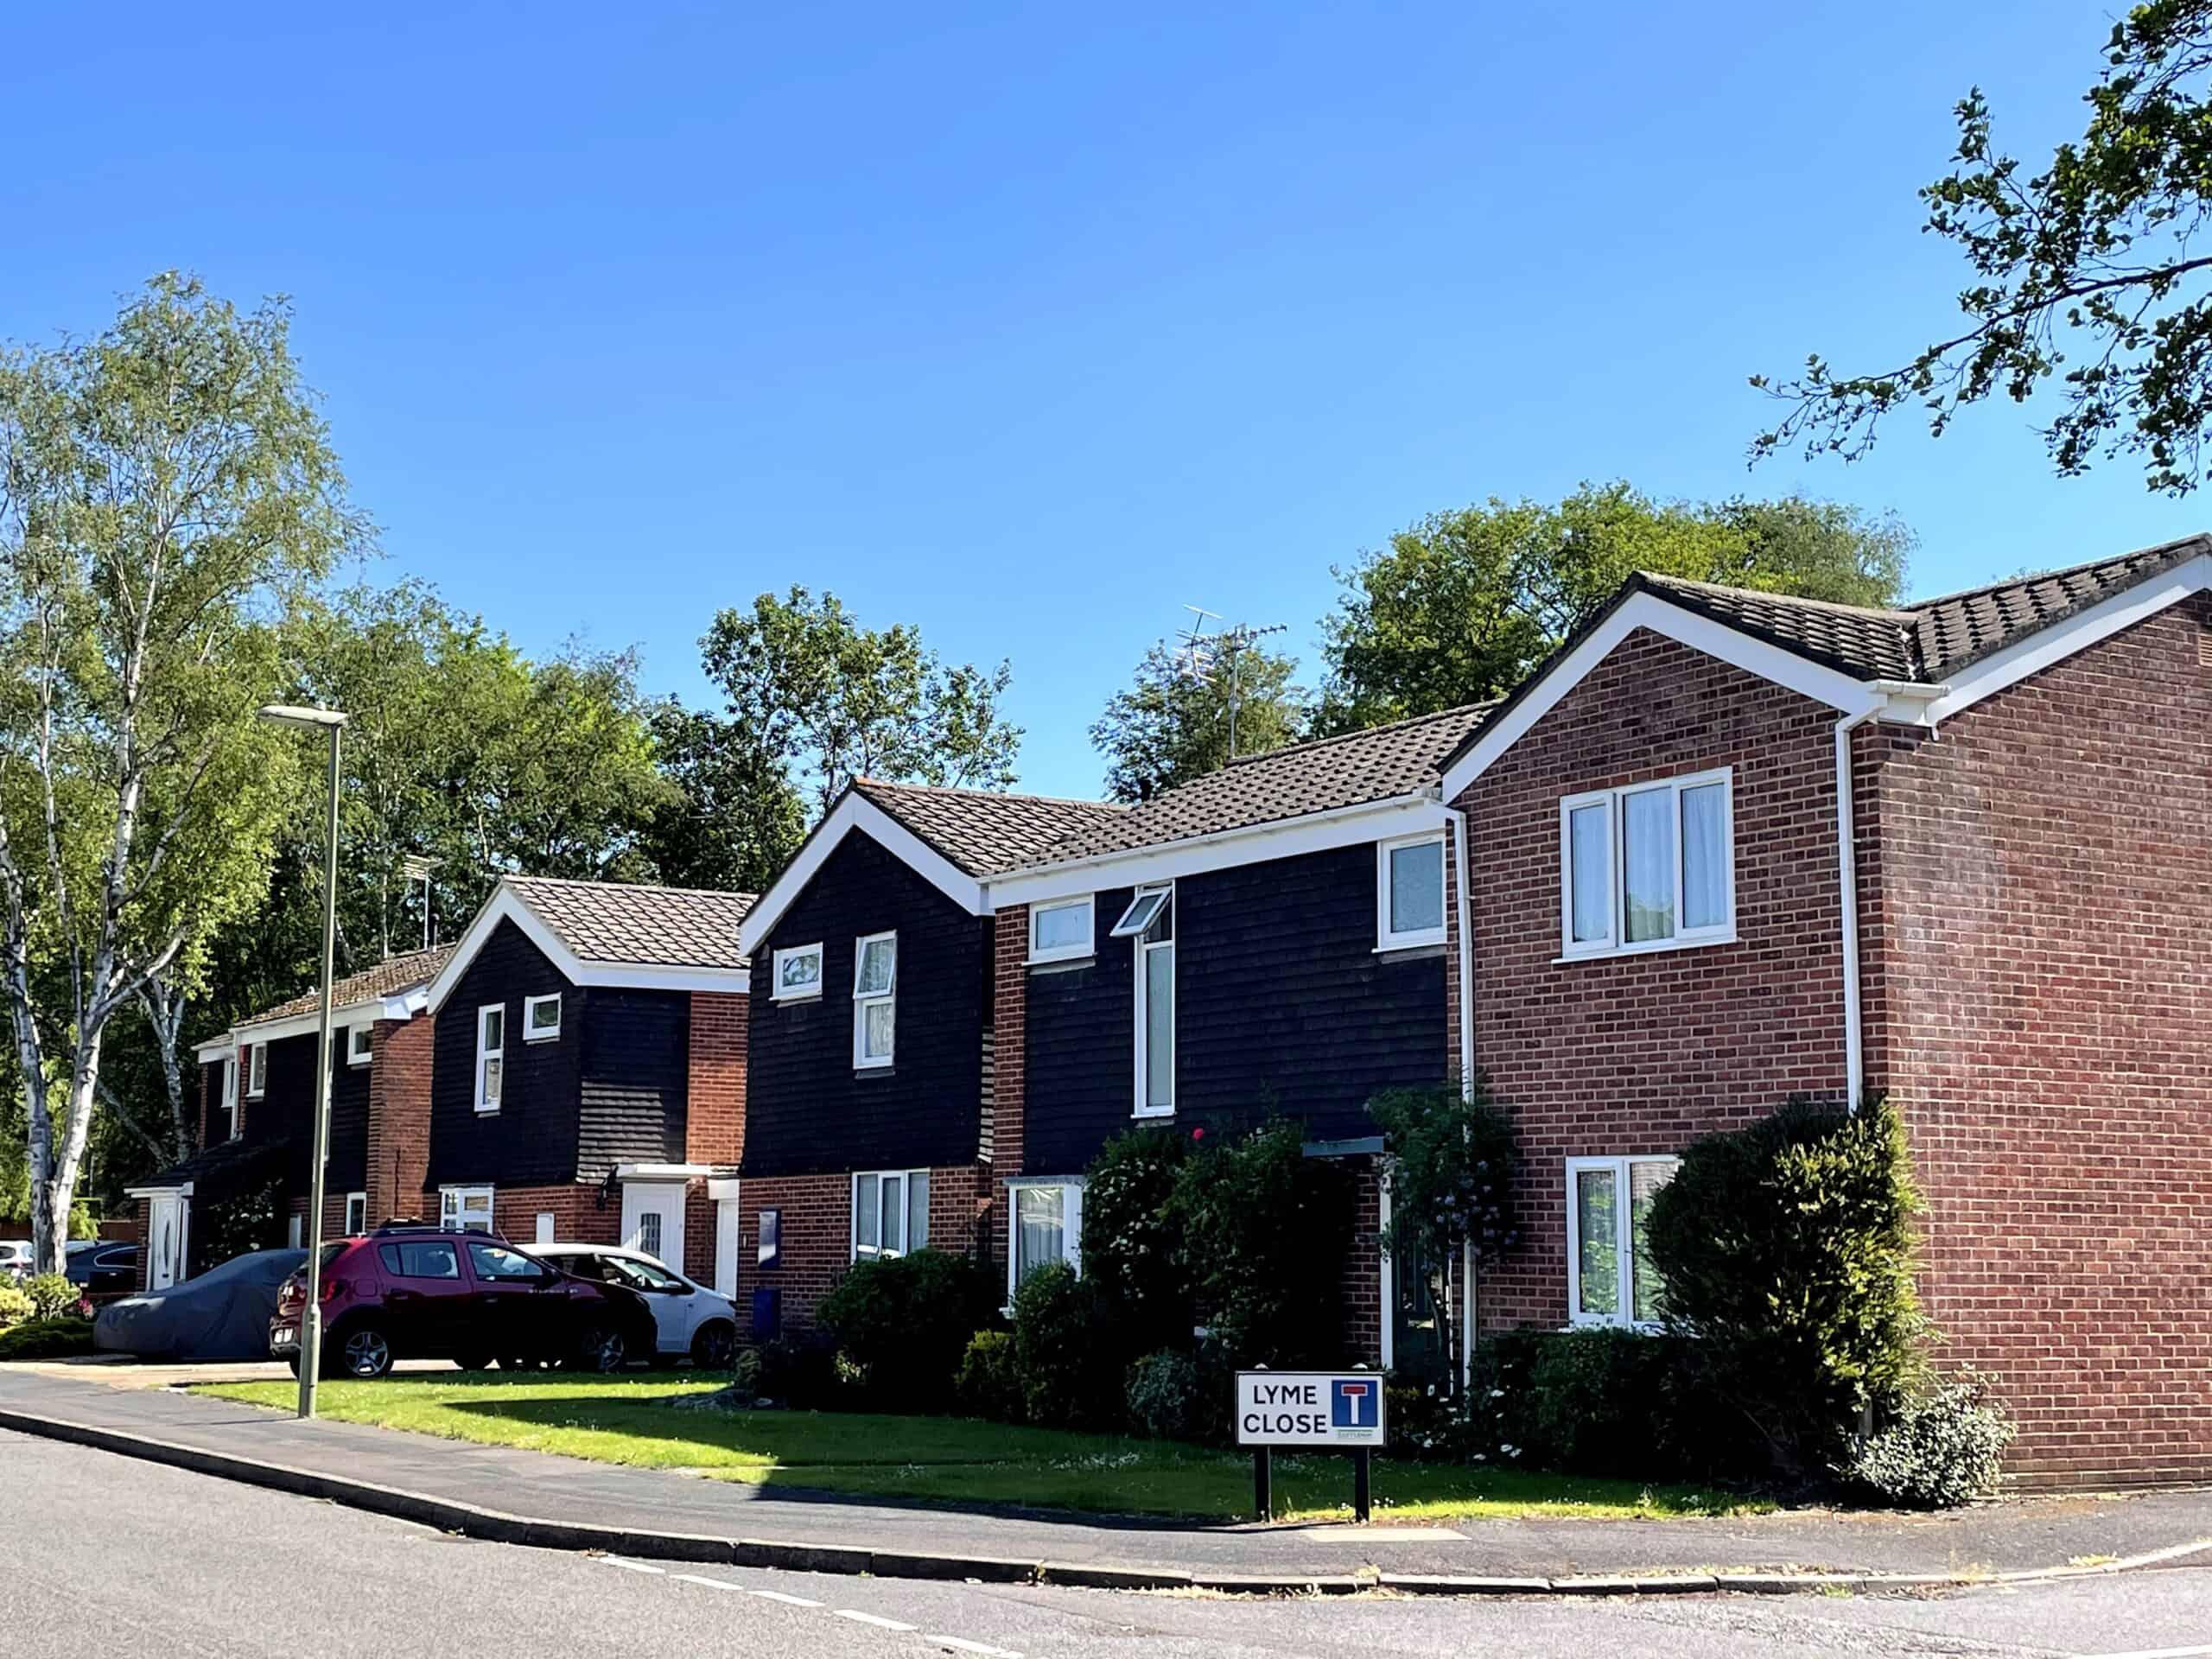 Property inspection report Southampton